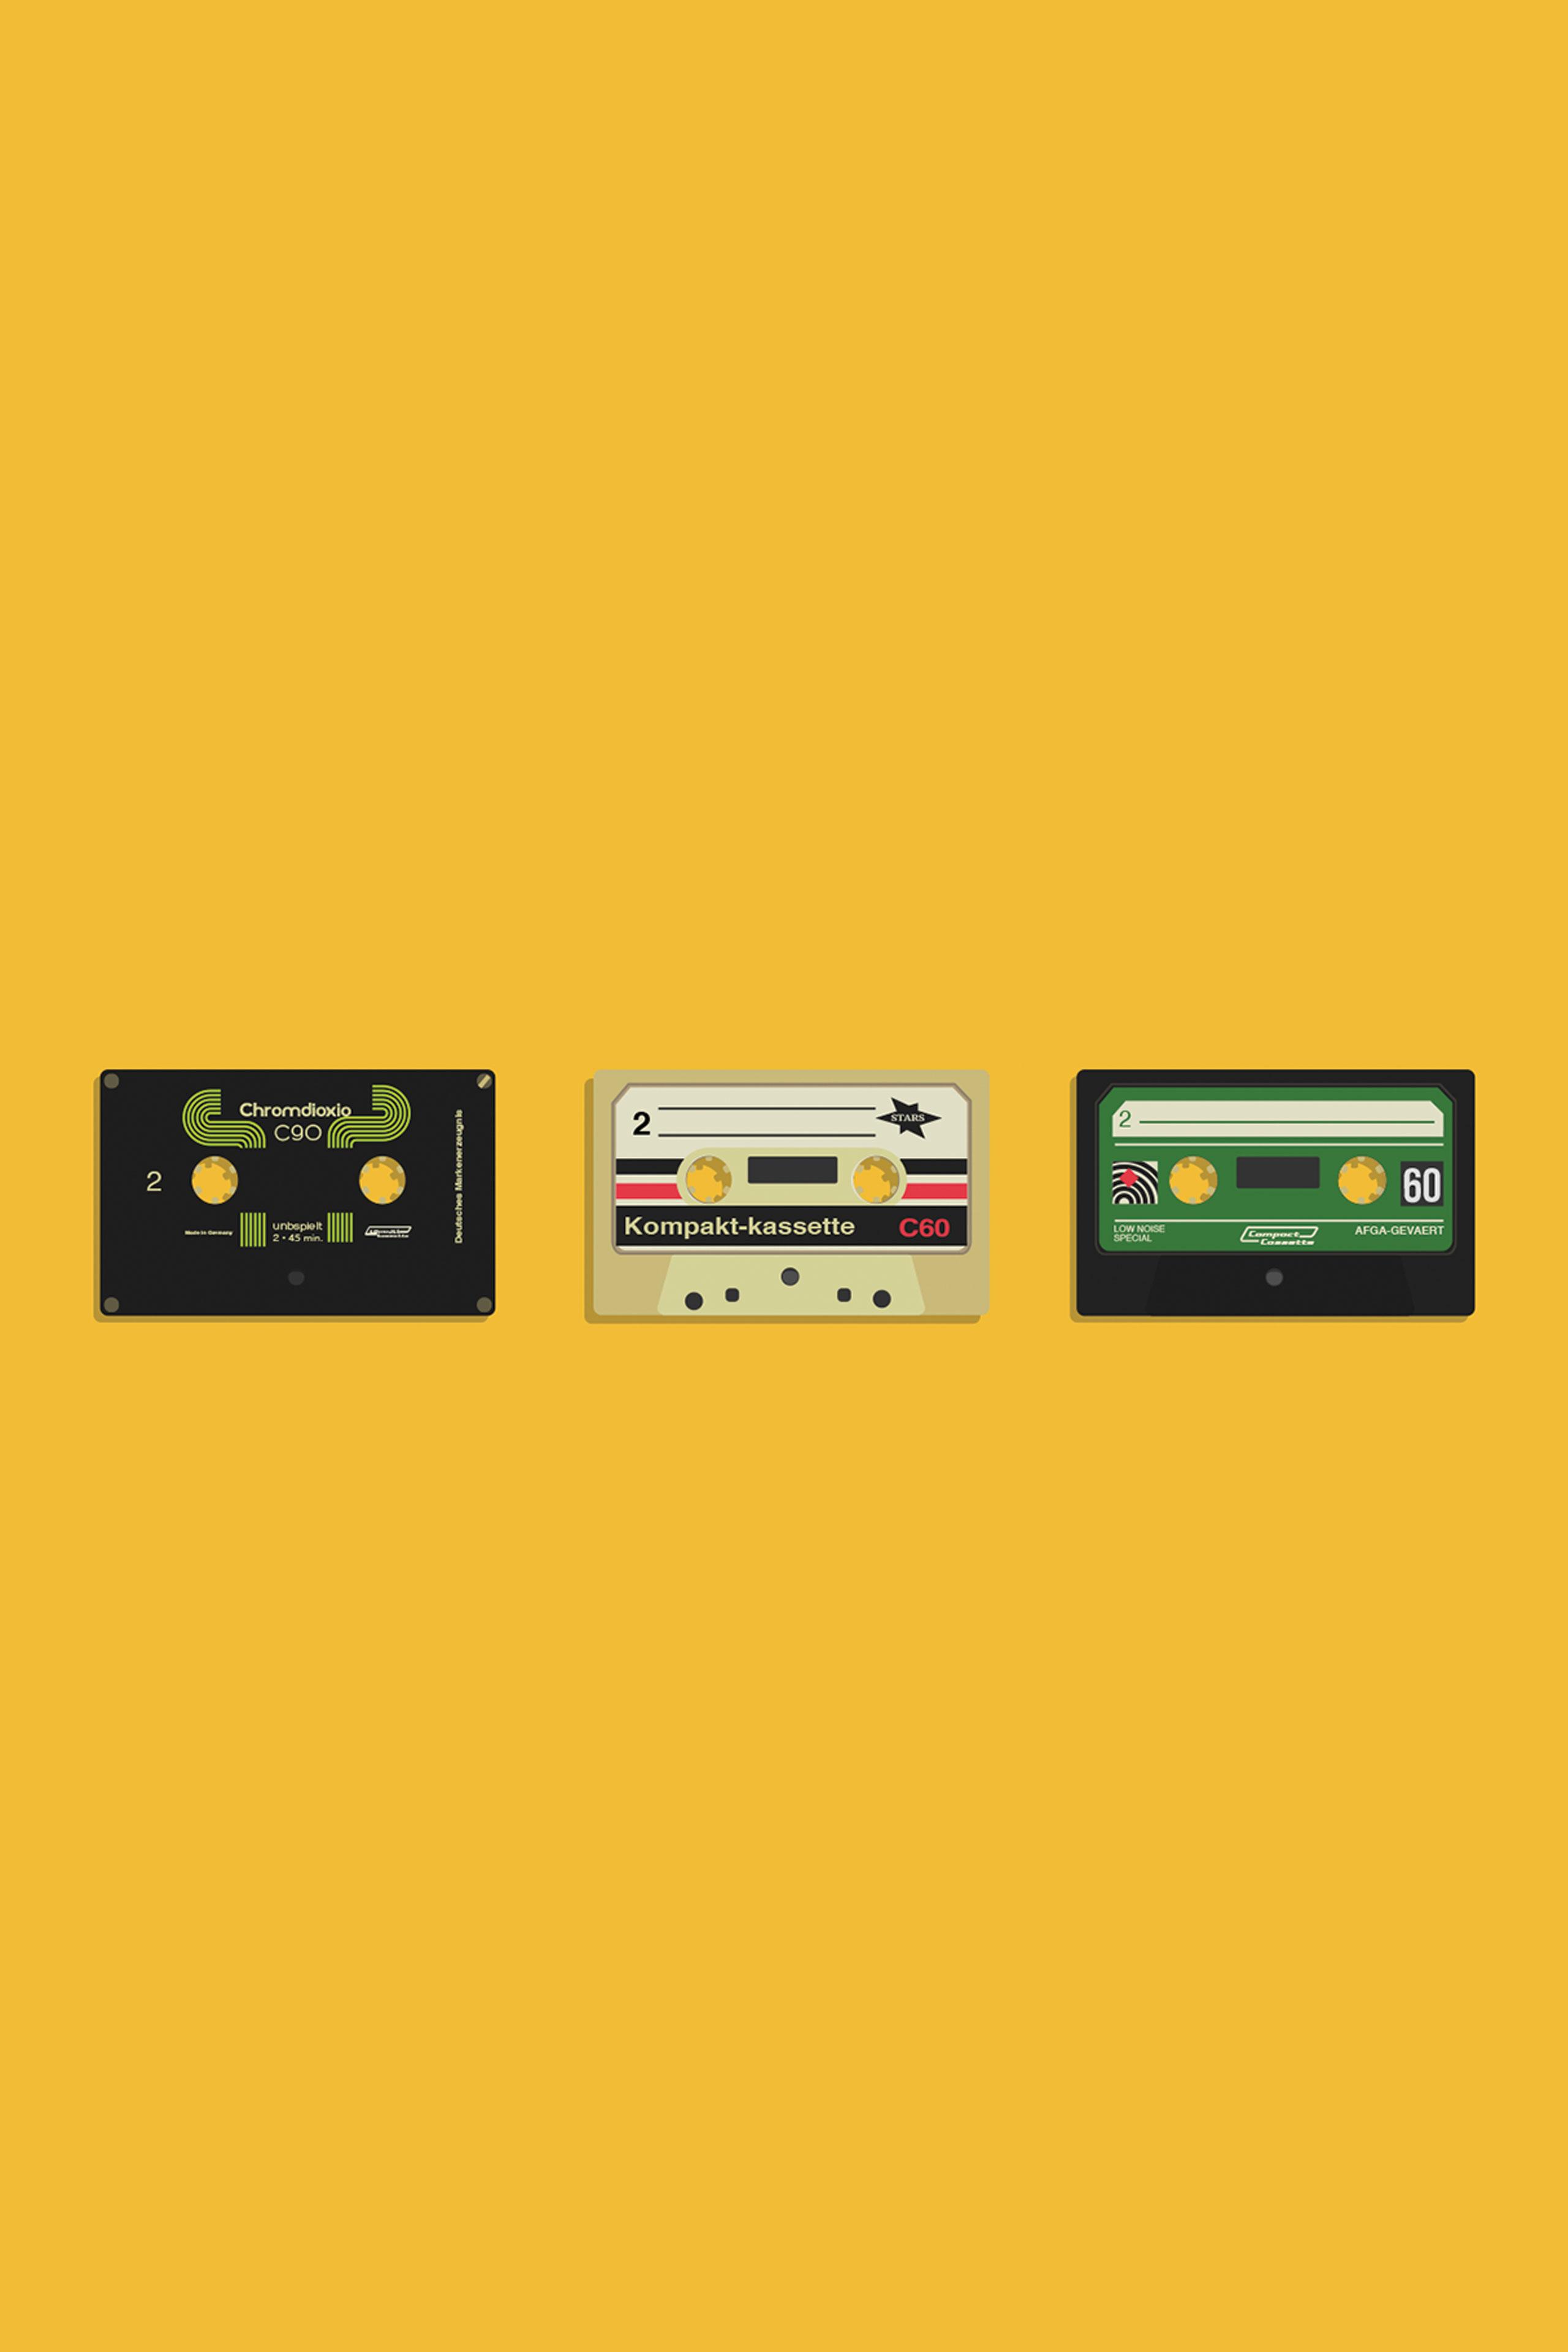 Retro Cassettes Mobile Wallpaper